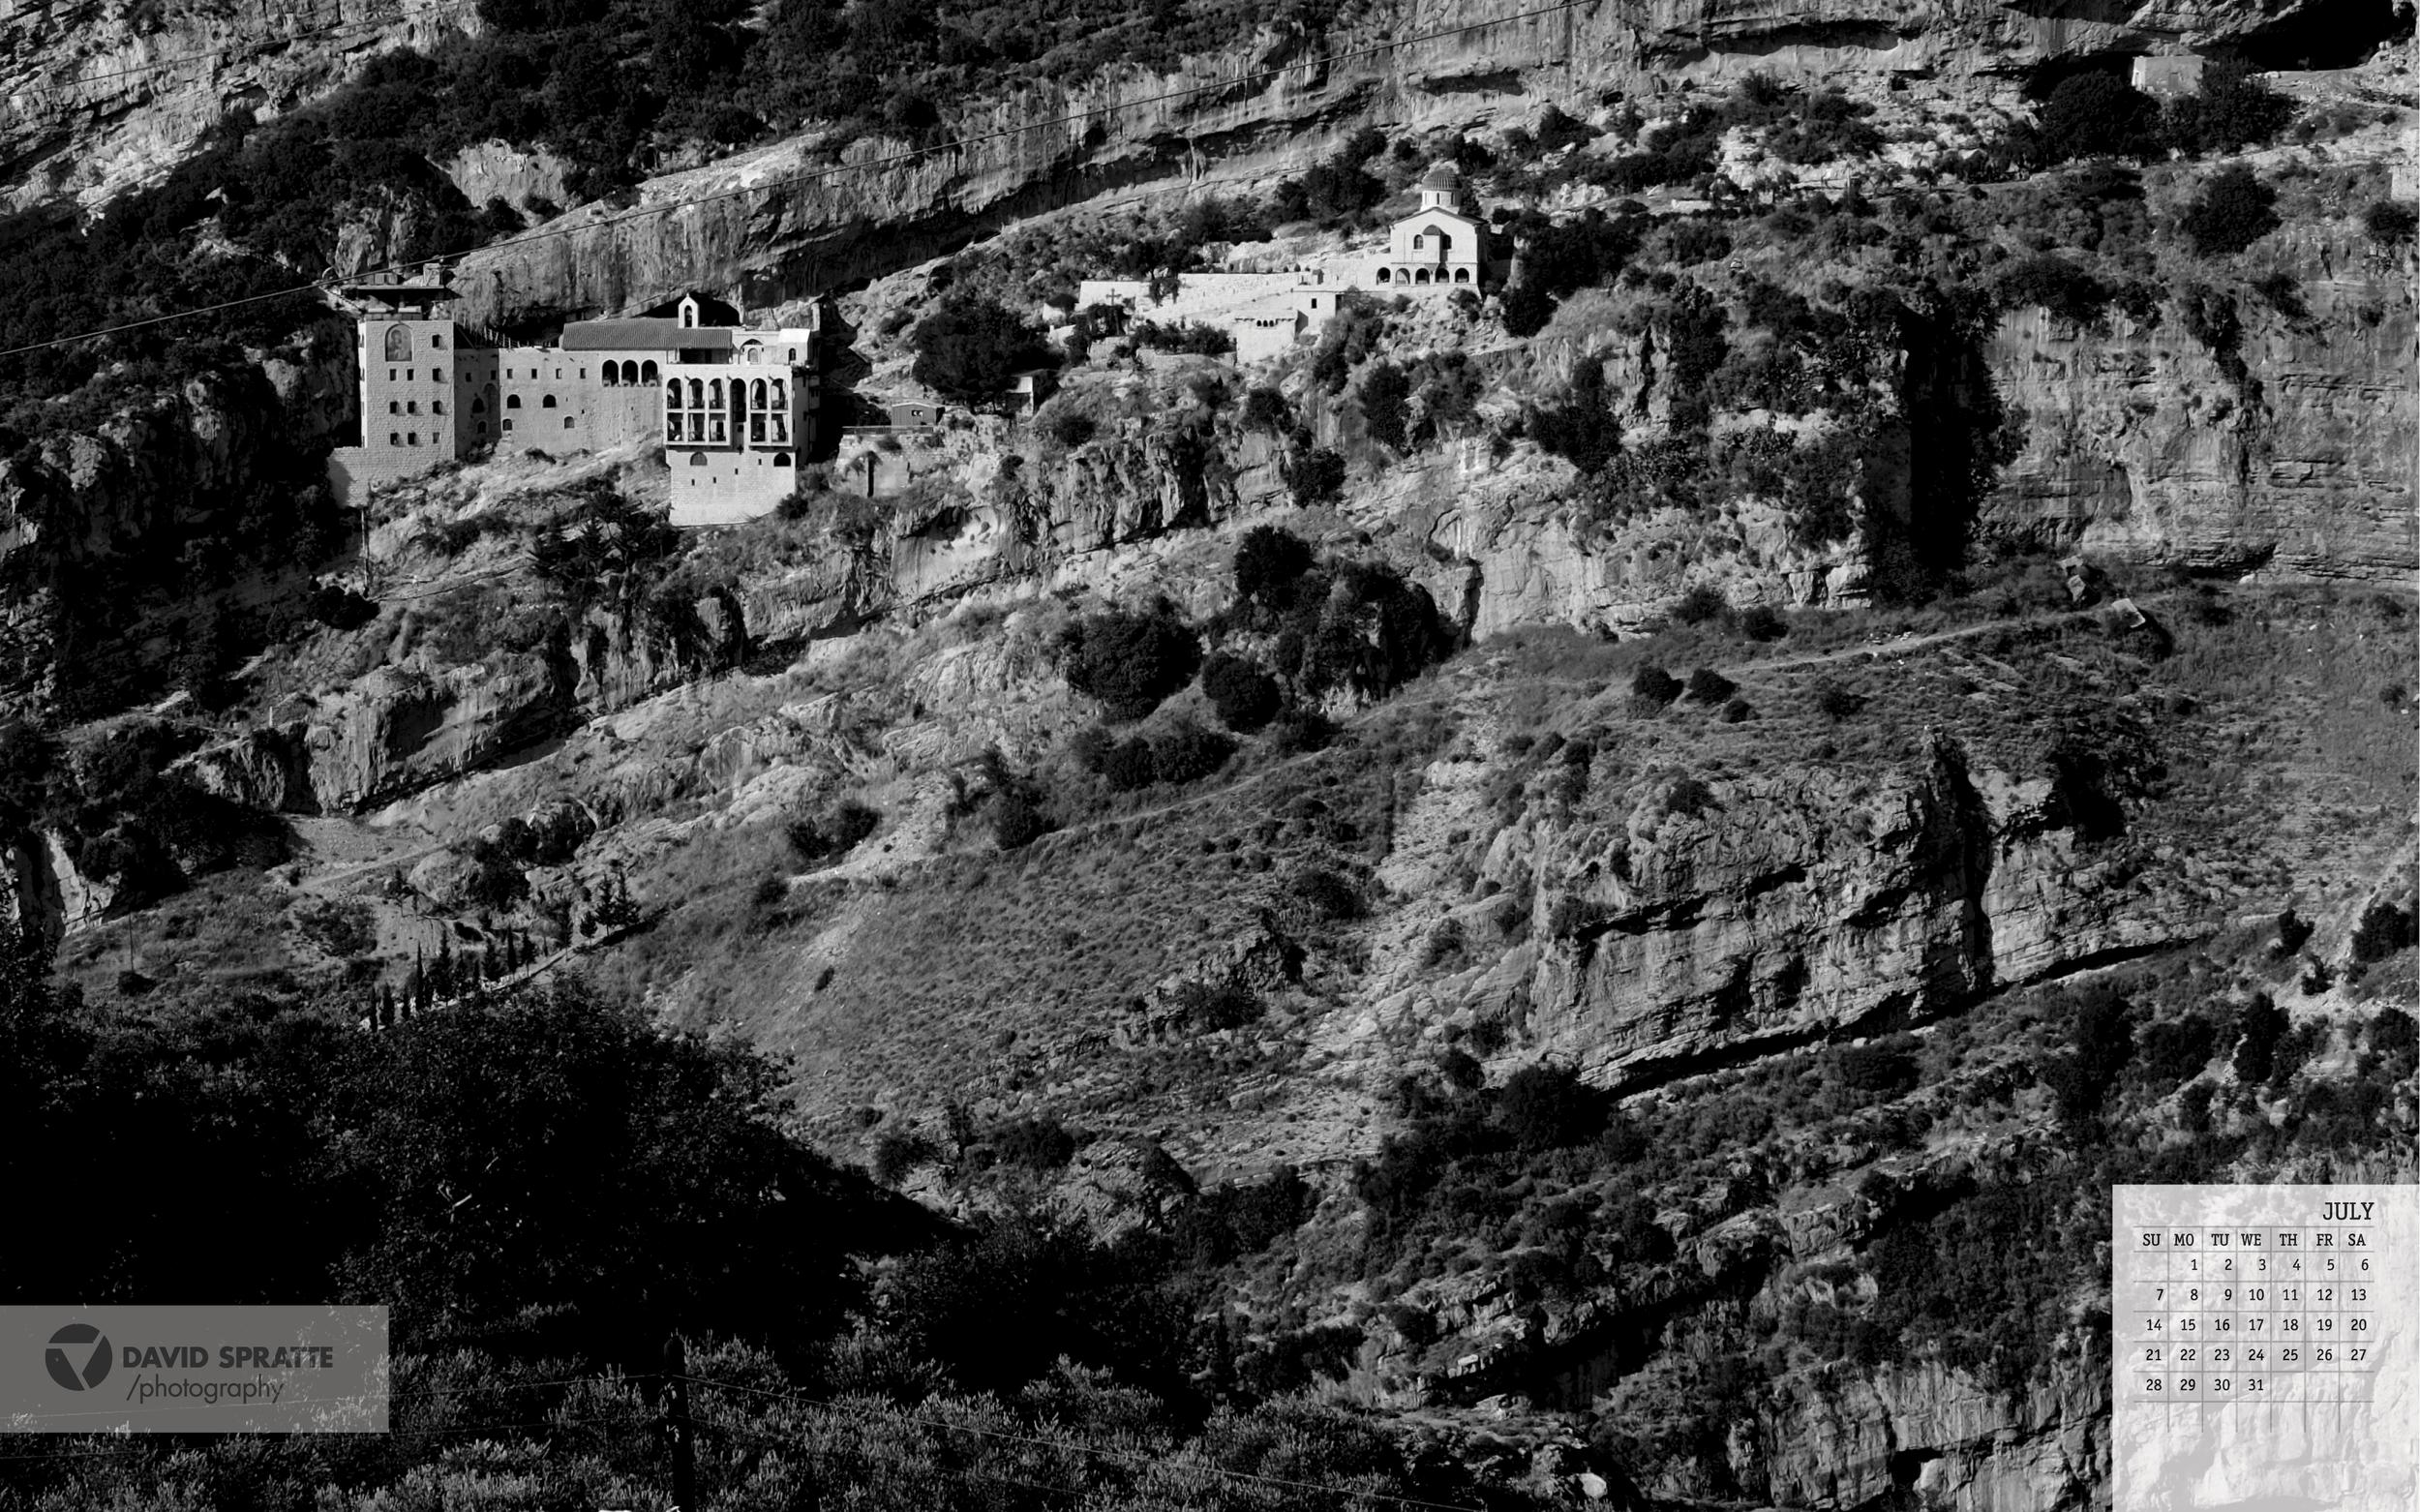 View of Hamatoura Monastery is July's wallpaper shot.